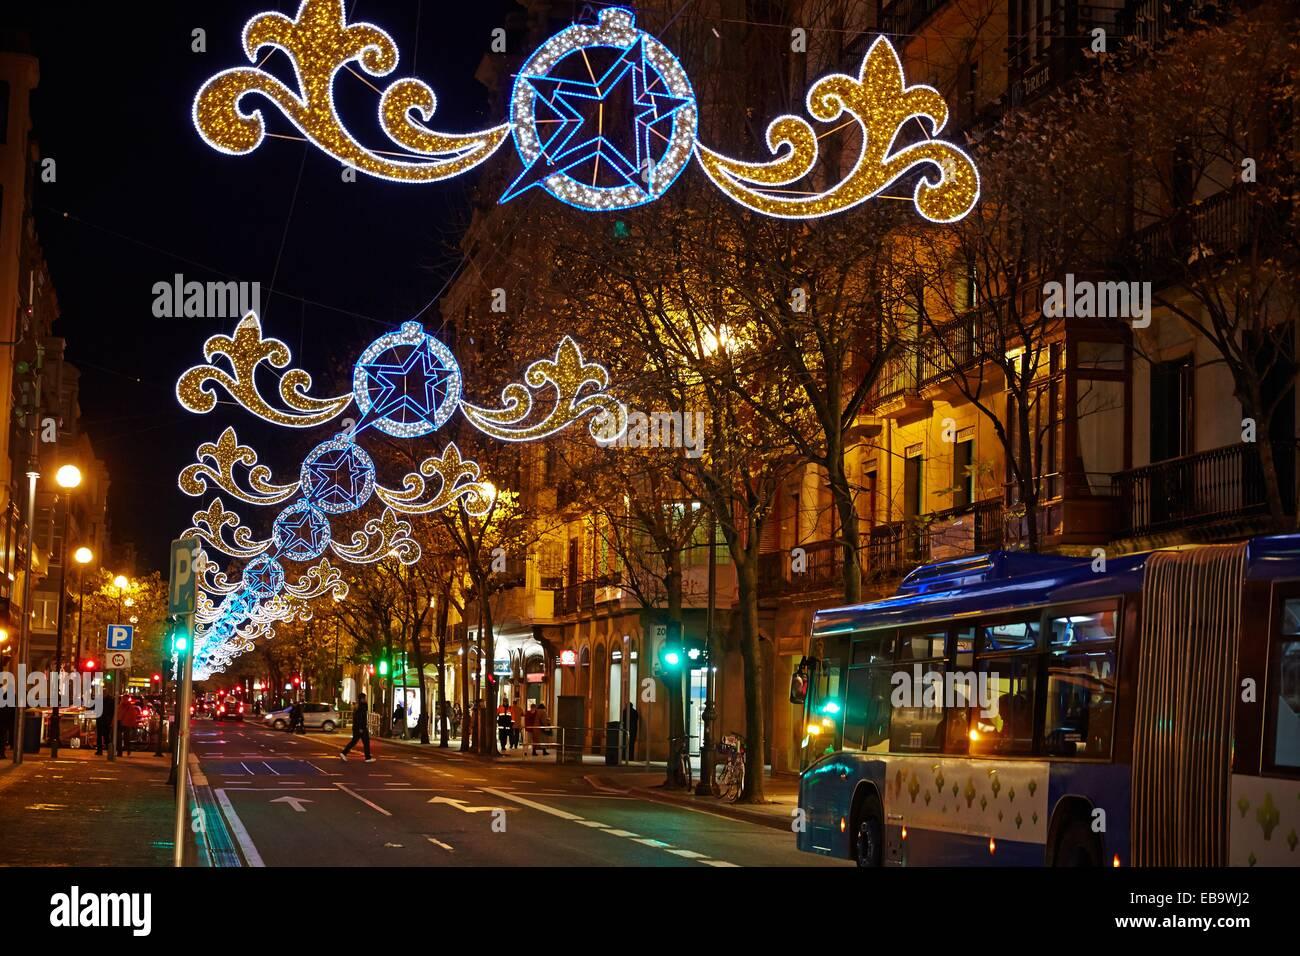 stra enbeleuchtung mit weihnachten urbieta stra e san sebastian donostia gipuzkoa baskischen. Black Bedroom Furniture Sets. Home Design Ideas